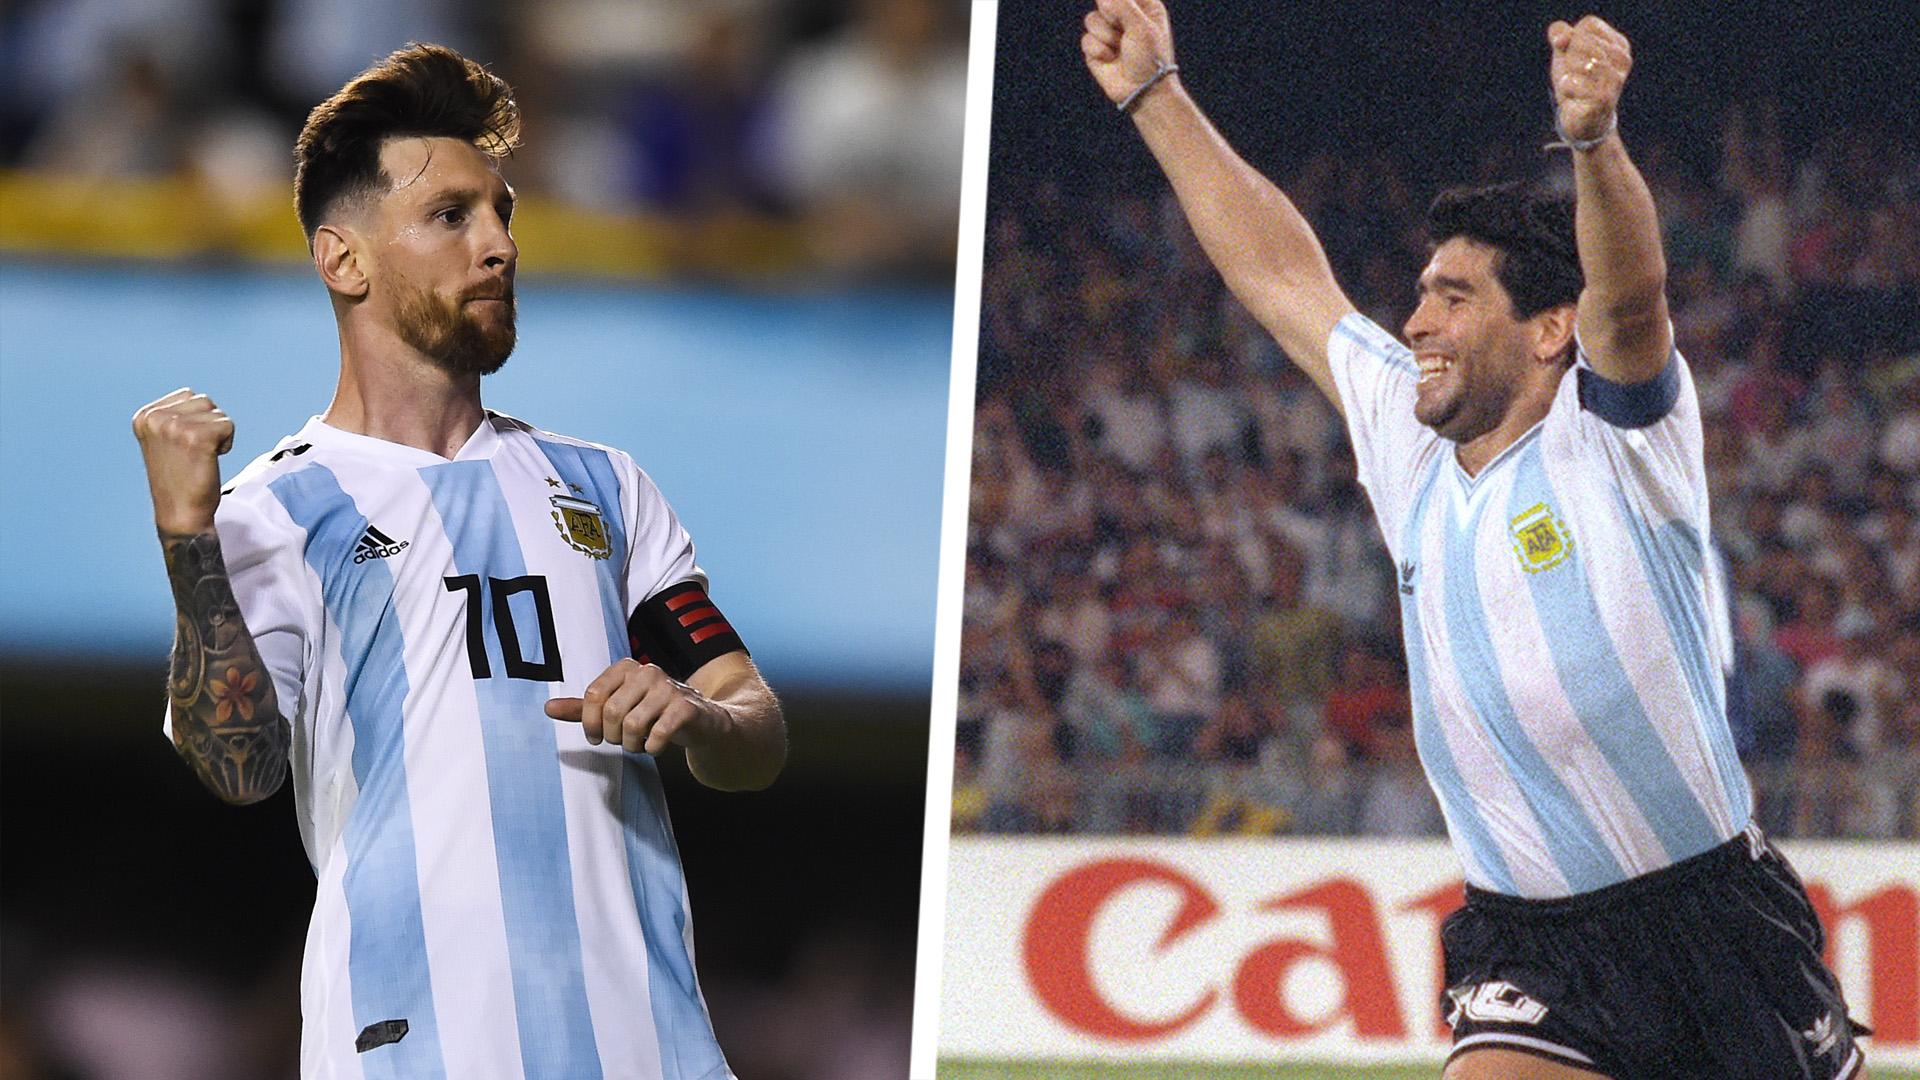 'Messi vs Maradona debate is unfair' – Veron can't pick between two icons of different eras